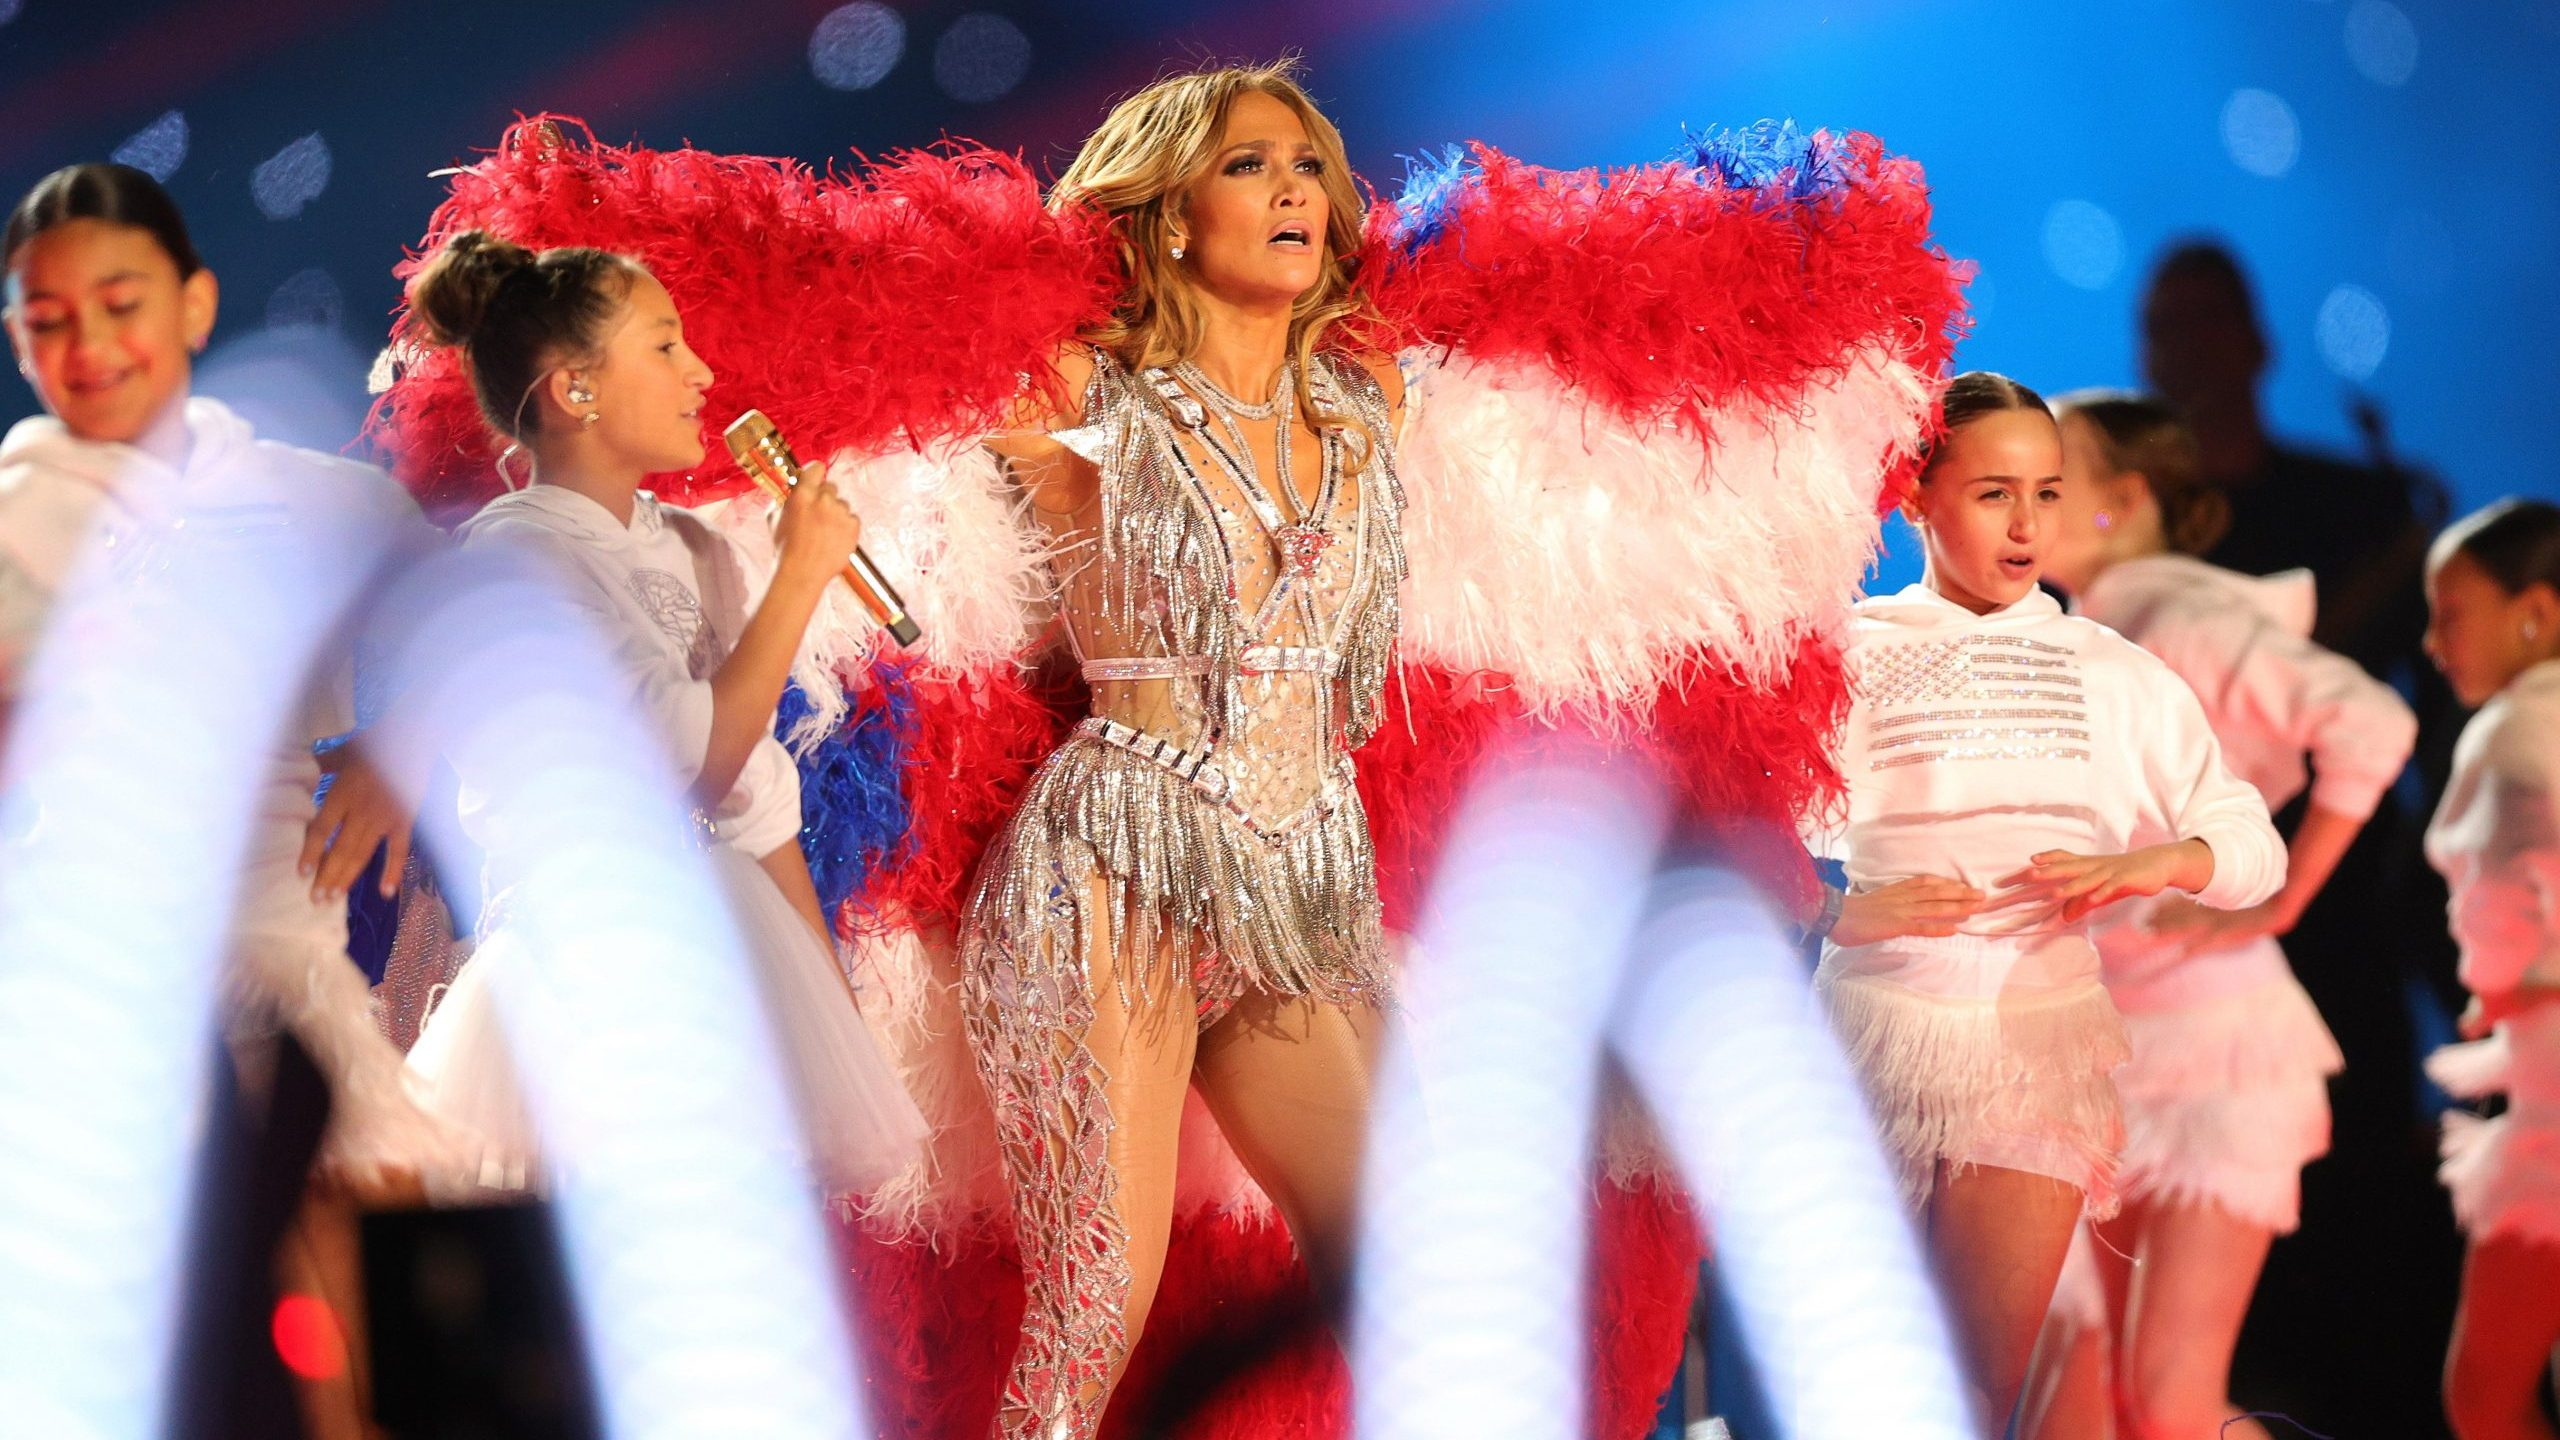 Jennifer Lopez performs with her daughter Emme Maribel Muñiz during the Pepsi Super Bowl LIV Halftime Show at Hard Rock Stadium on Feb. 2, 2020, in Miami, Florida. (Credit: Tom Pennington / Getty Images)